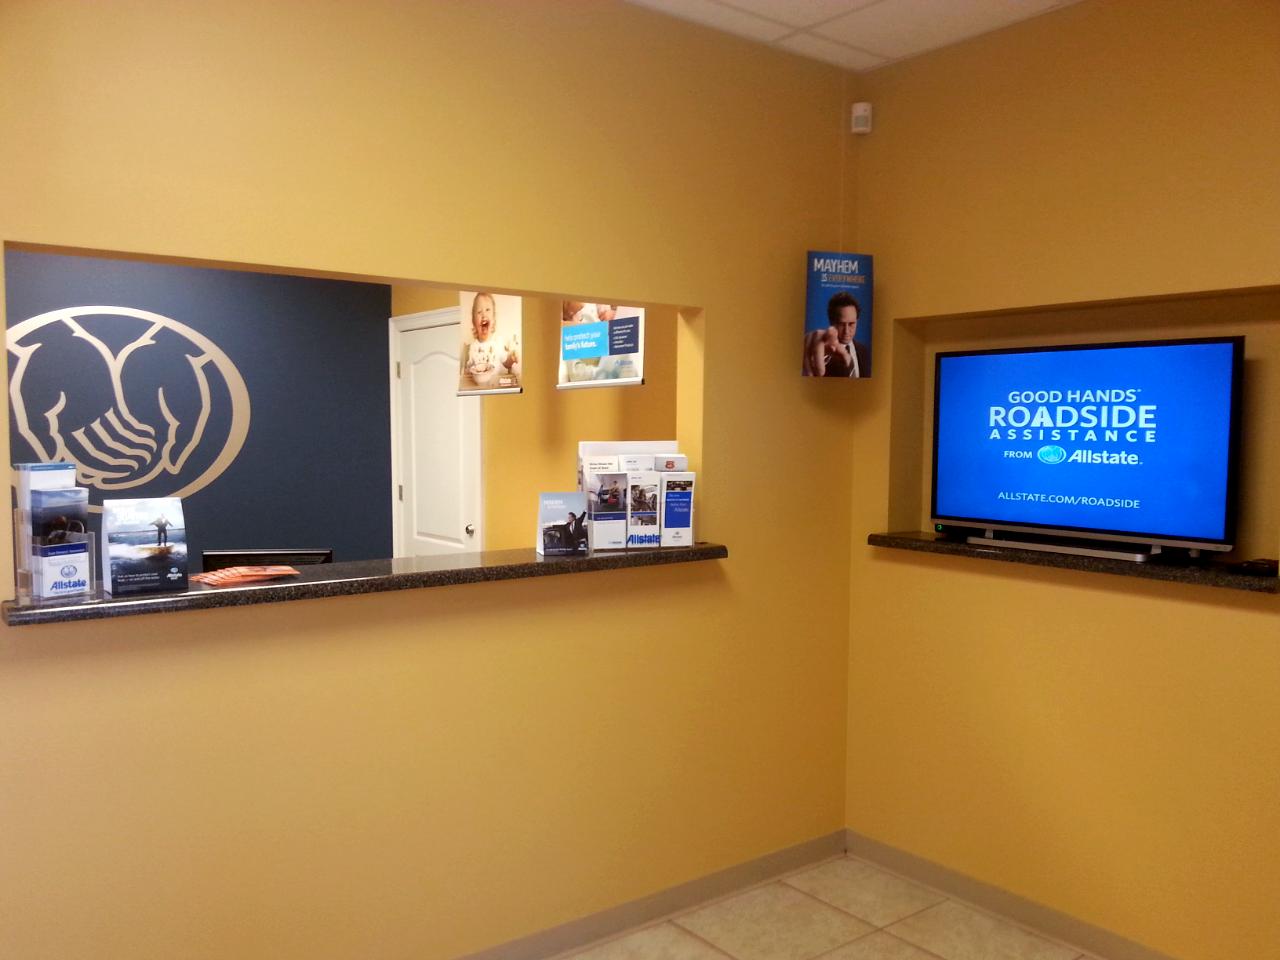 Betsy McArn: Allstate Insurance image 2